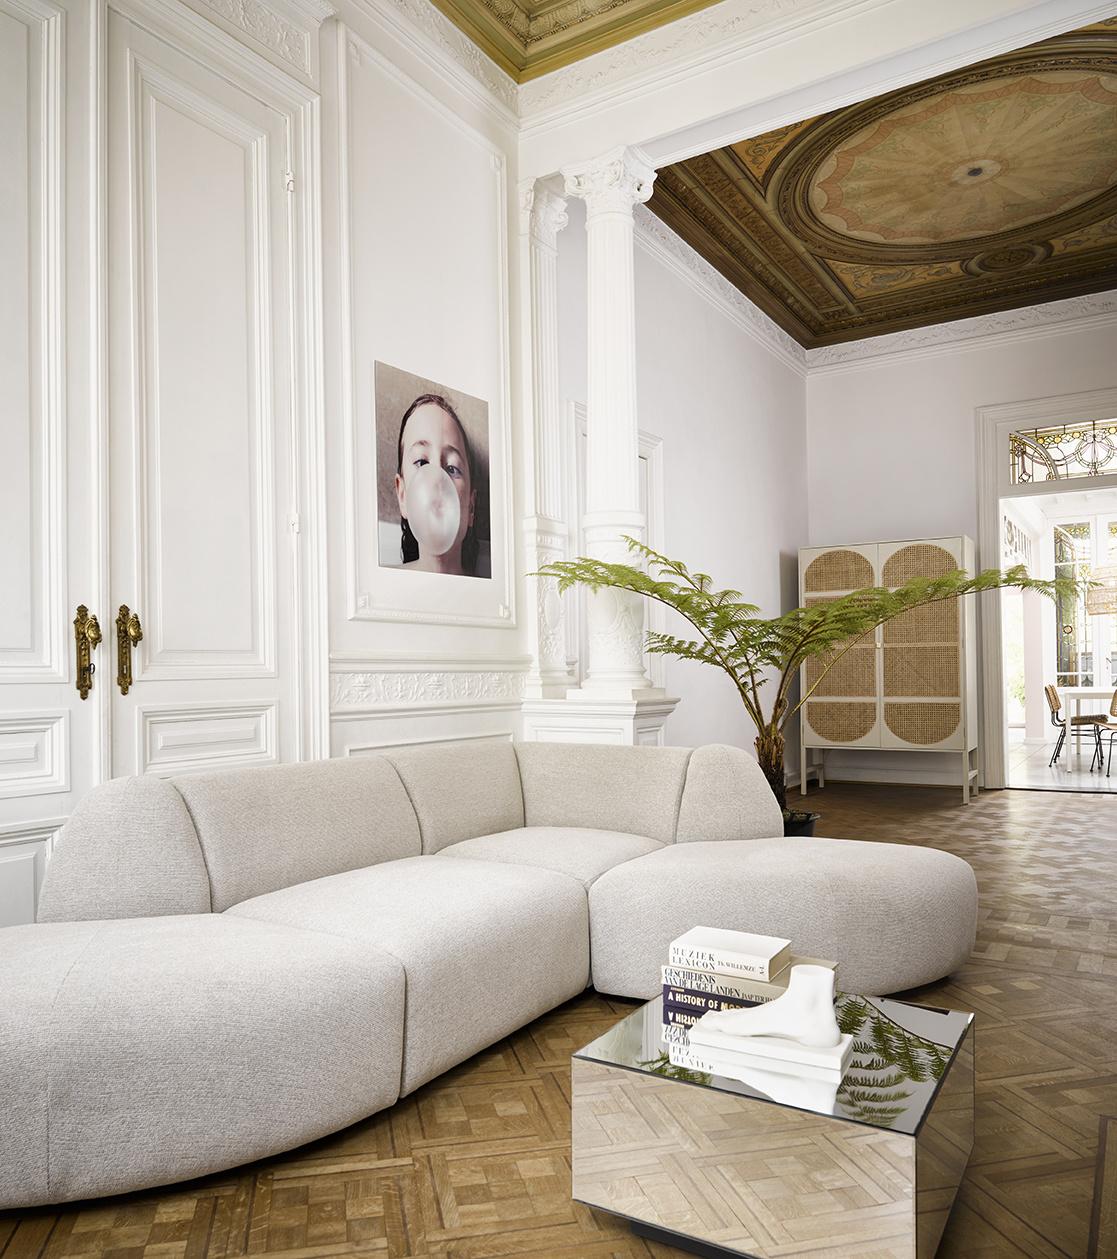 Hocker jax couch: element hocker sneak, light grey-3